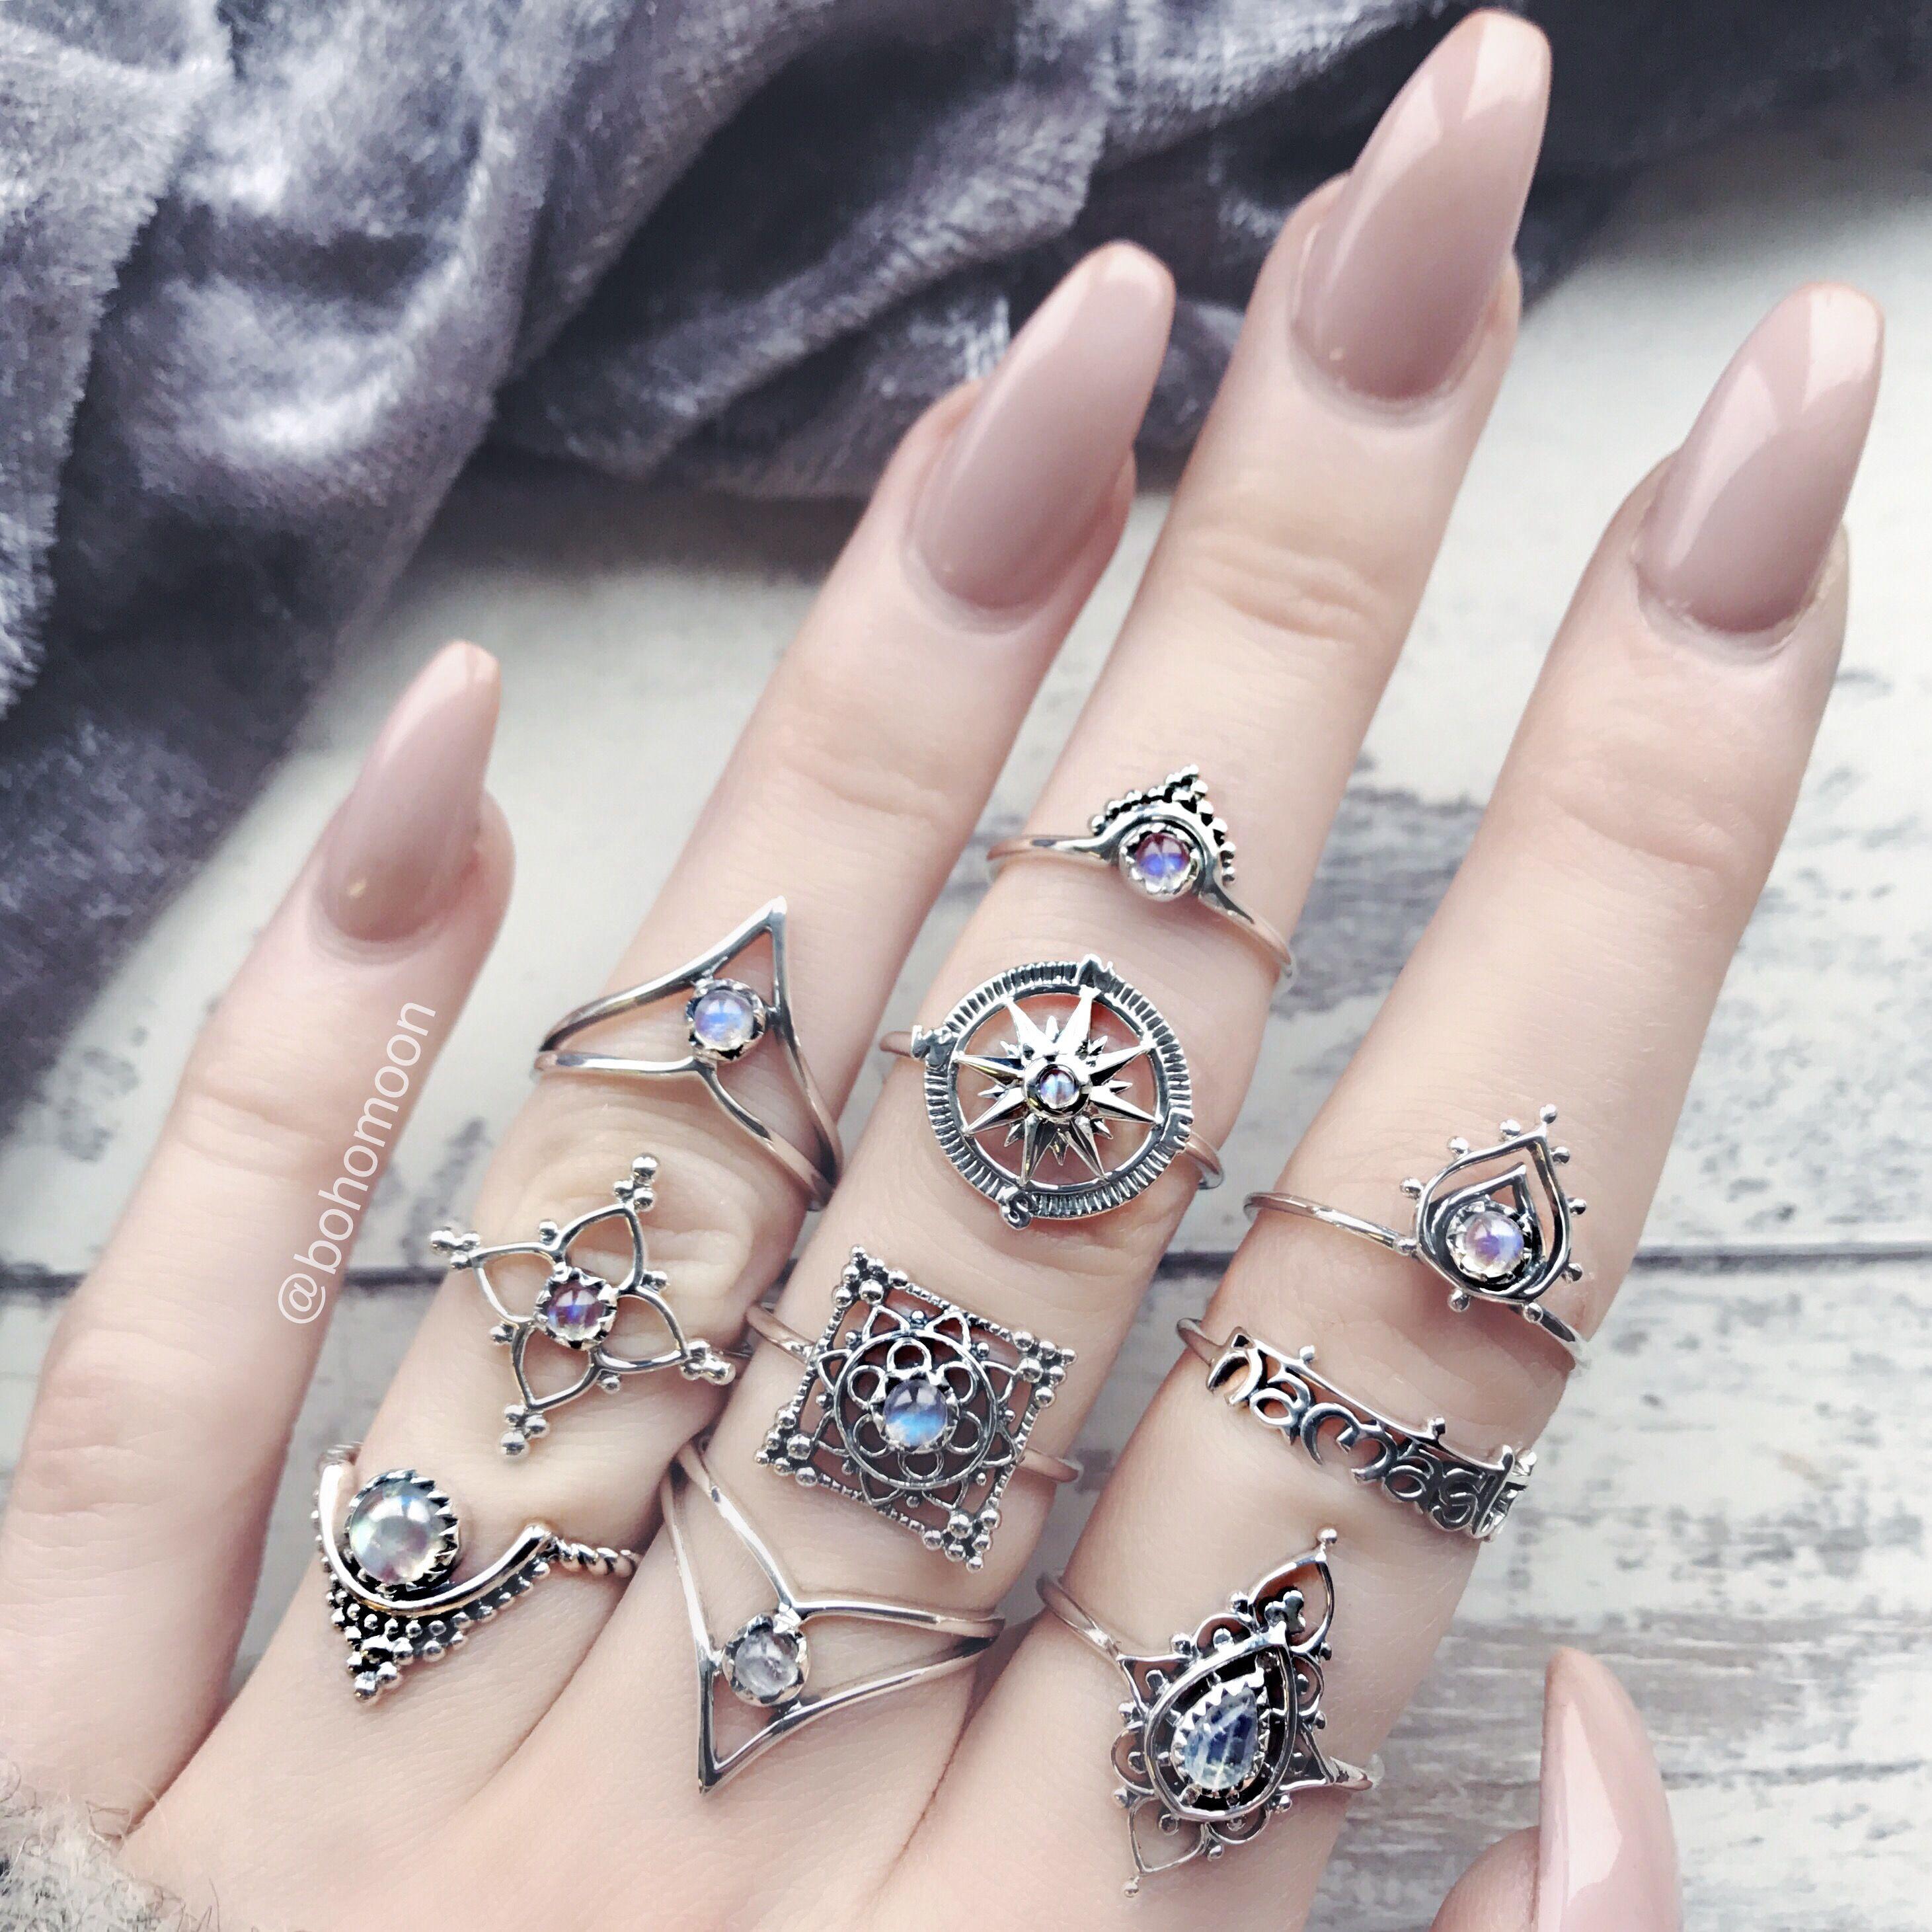 Free photo: Nail jewelry - people, performance, nail - CC0 License ...